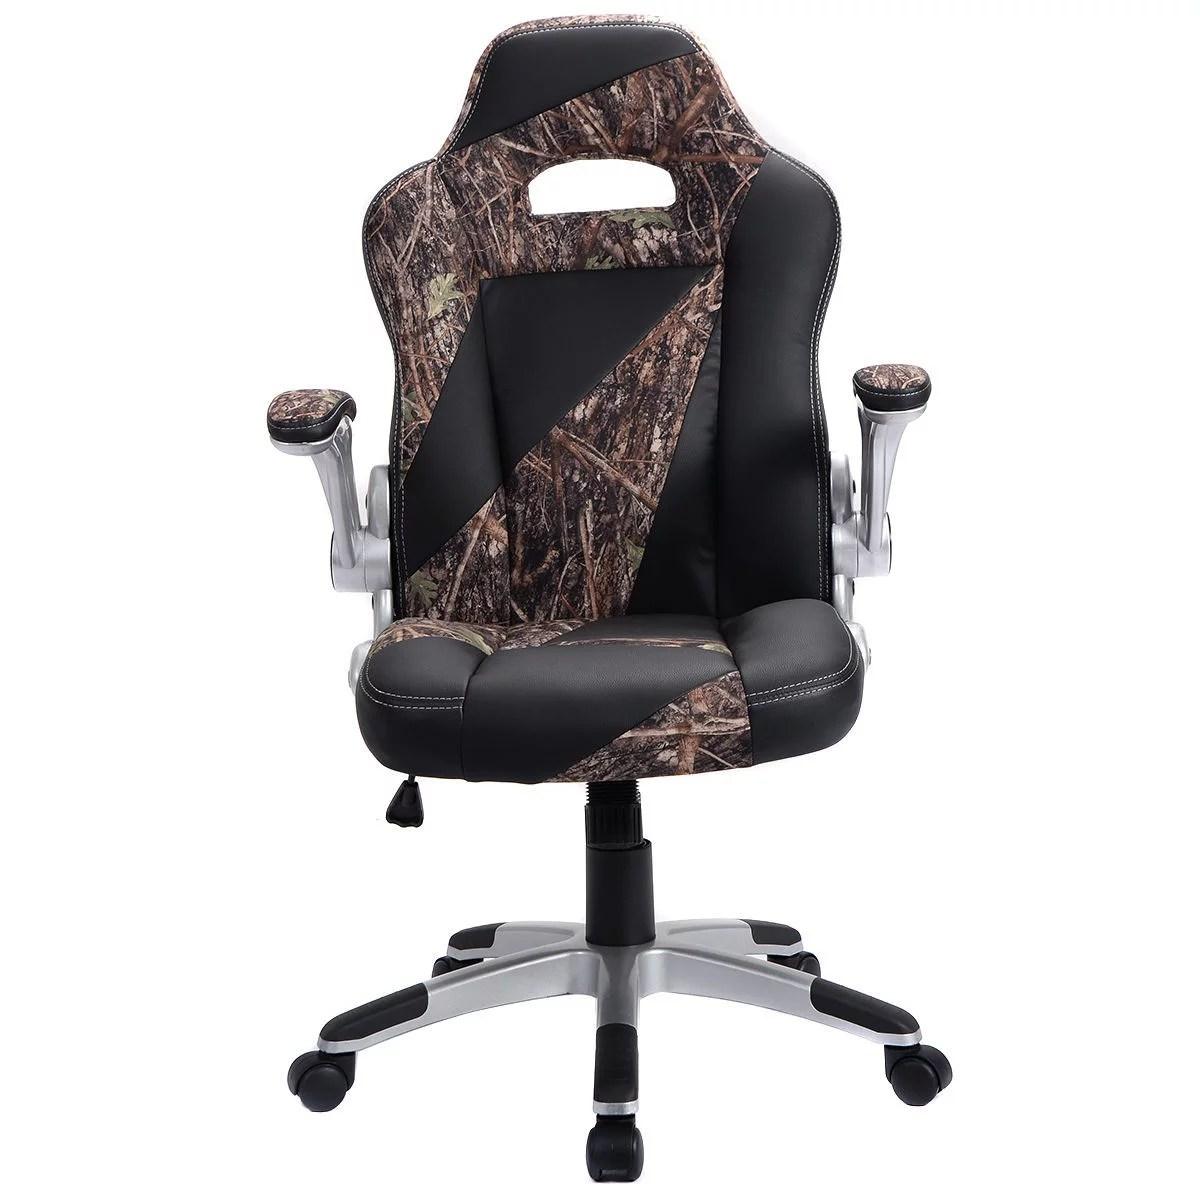 PU Leather High Back Executive Office Desk Task Computer